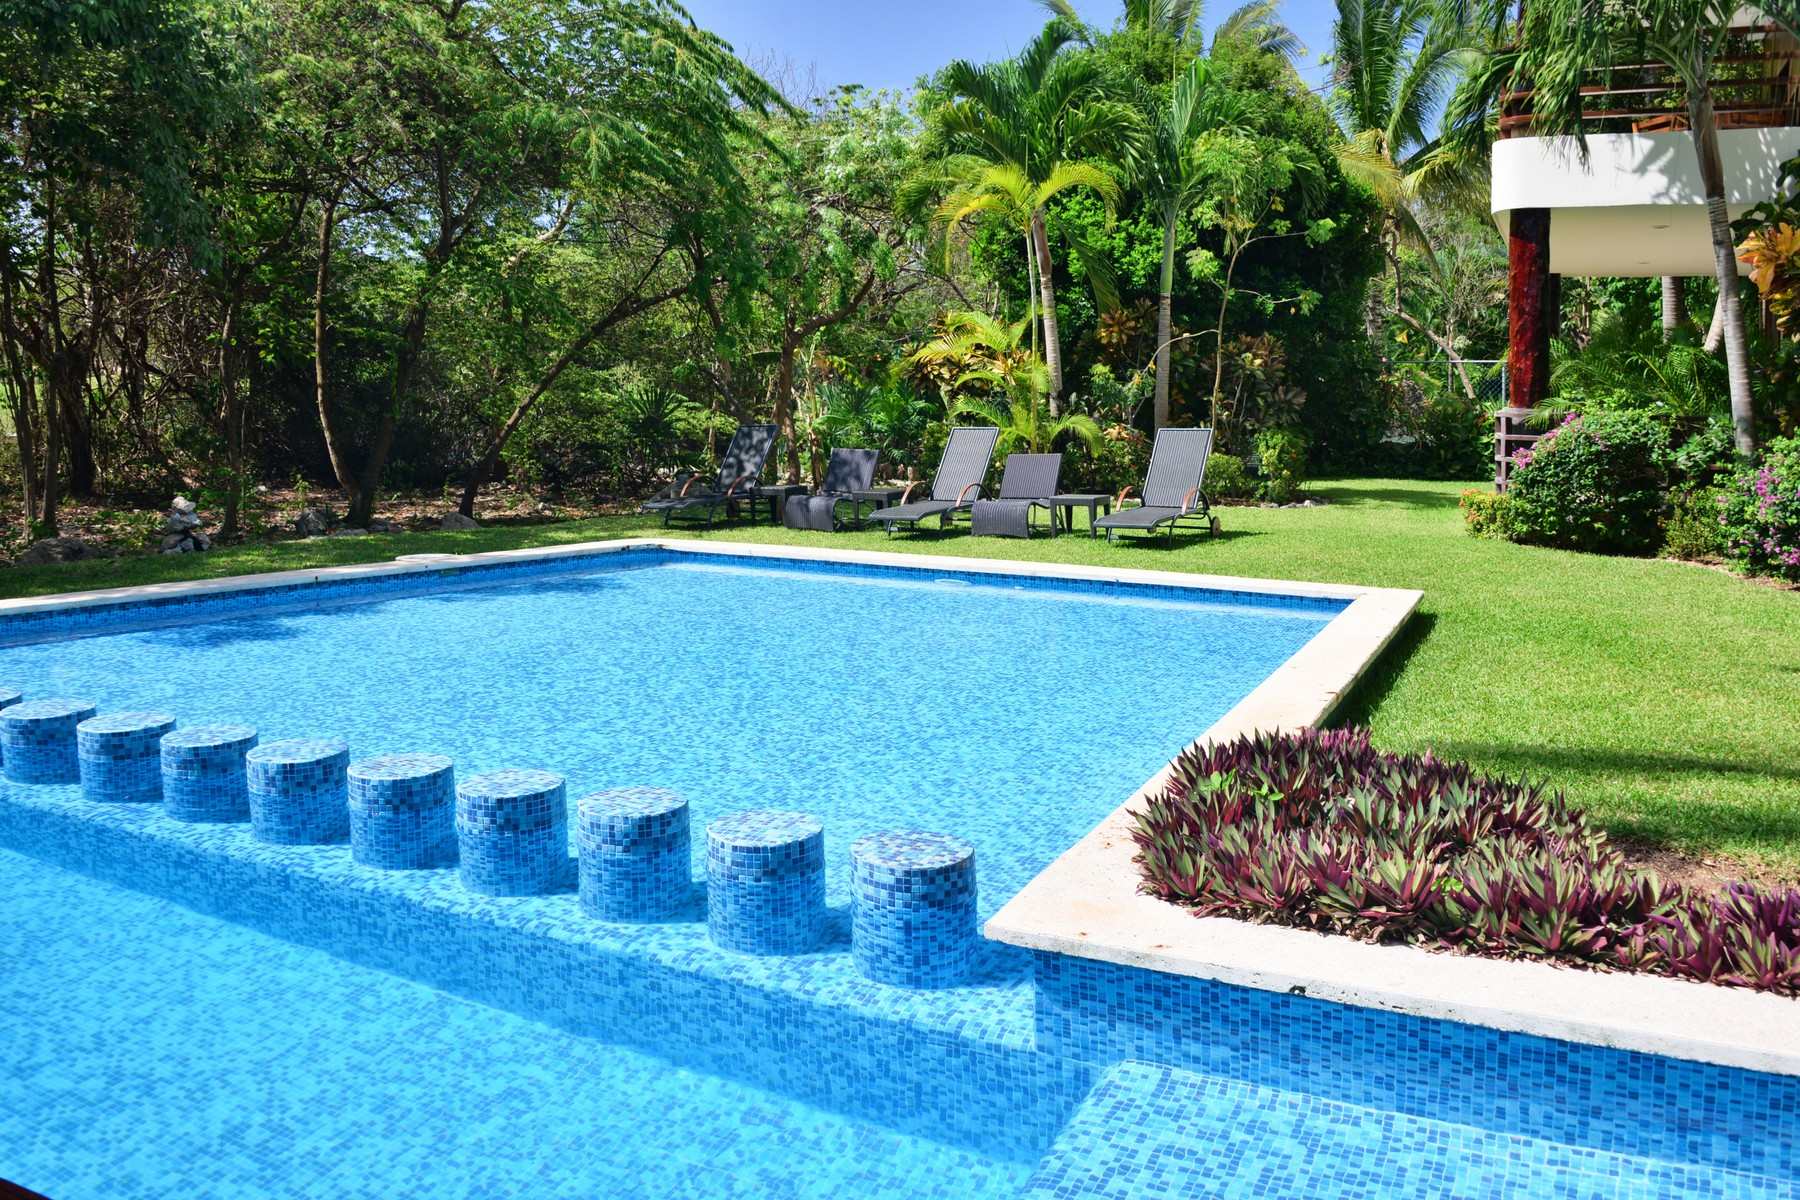 Additional photo for property listing at AKOYA LIVING IN THE GREEN Akoya, Villas Pakal Ret 3 Chichenitza Lot 19 Mza 16 Playa Del Carmen, Quintana Roo 77710 Mexico